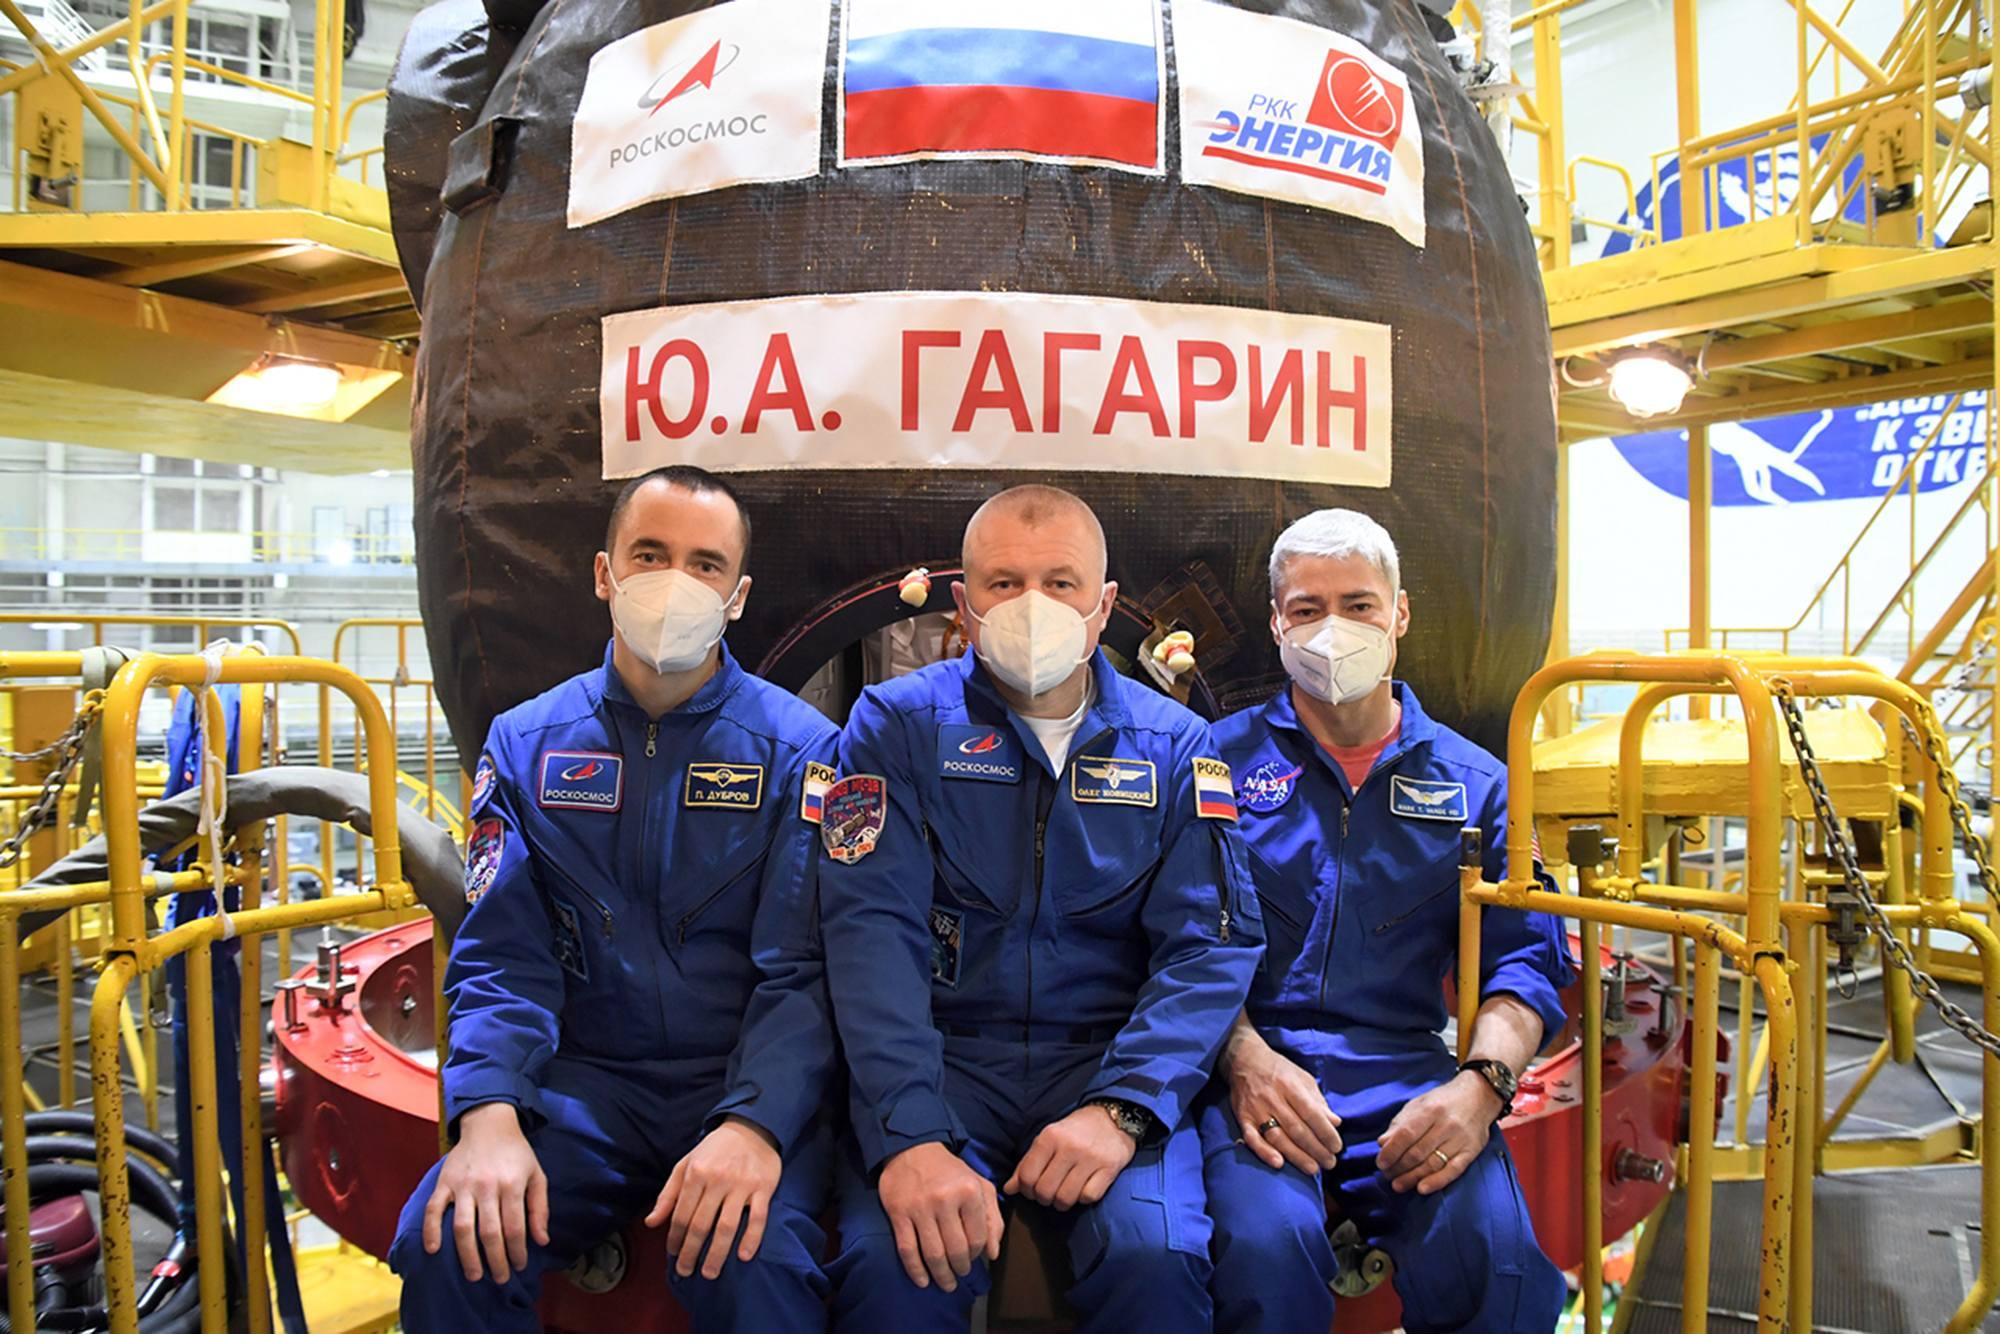 L'équipage principal de vant le compartiment orbital de Soyouz MS-18 arborant le nom de Youri Gagarine.